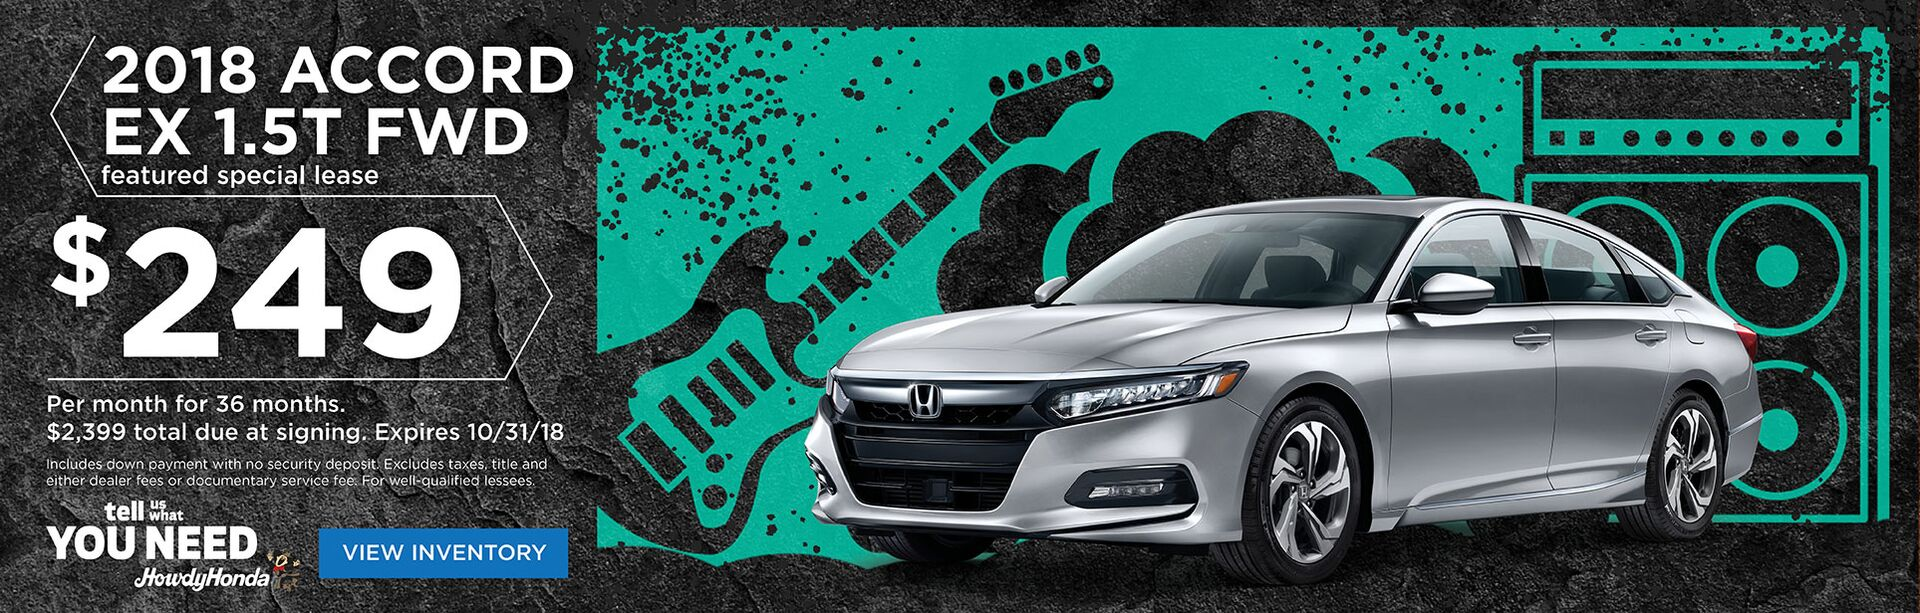 Honda Accord Fall Special